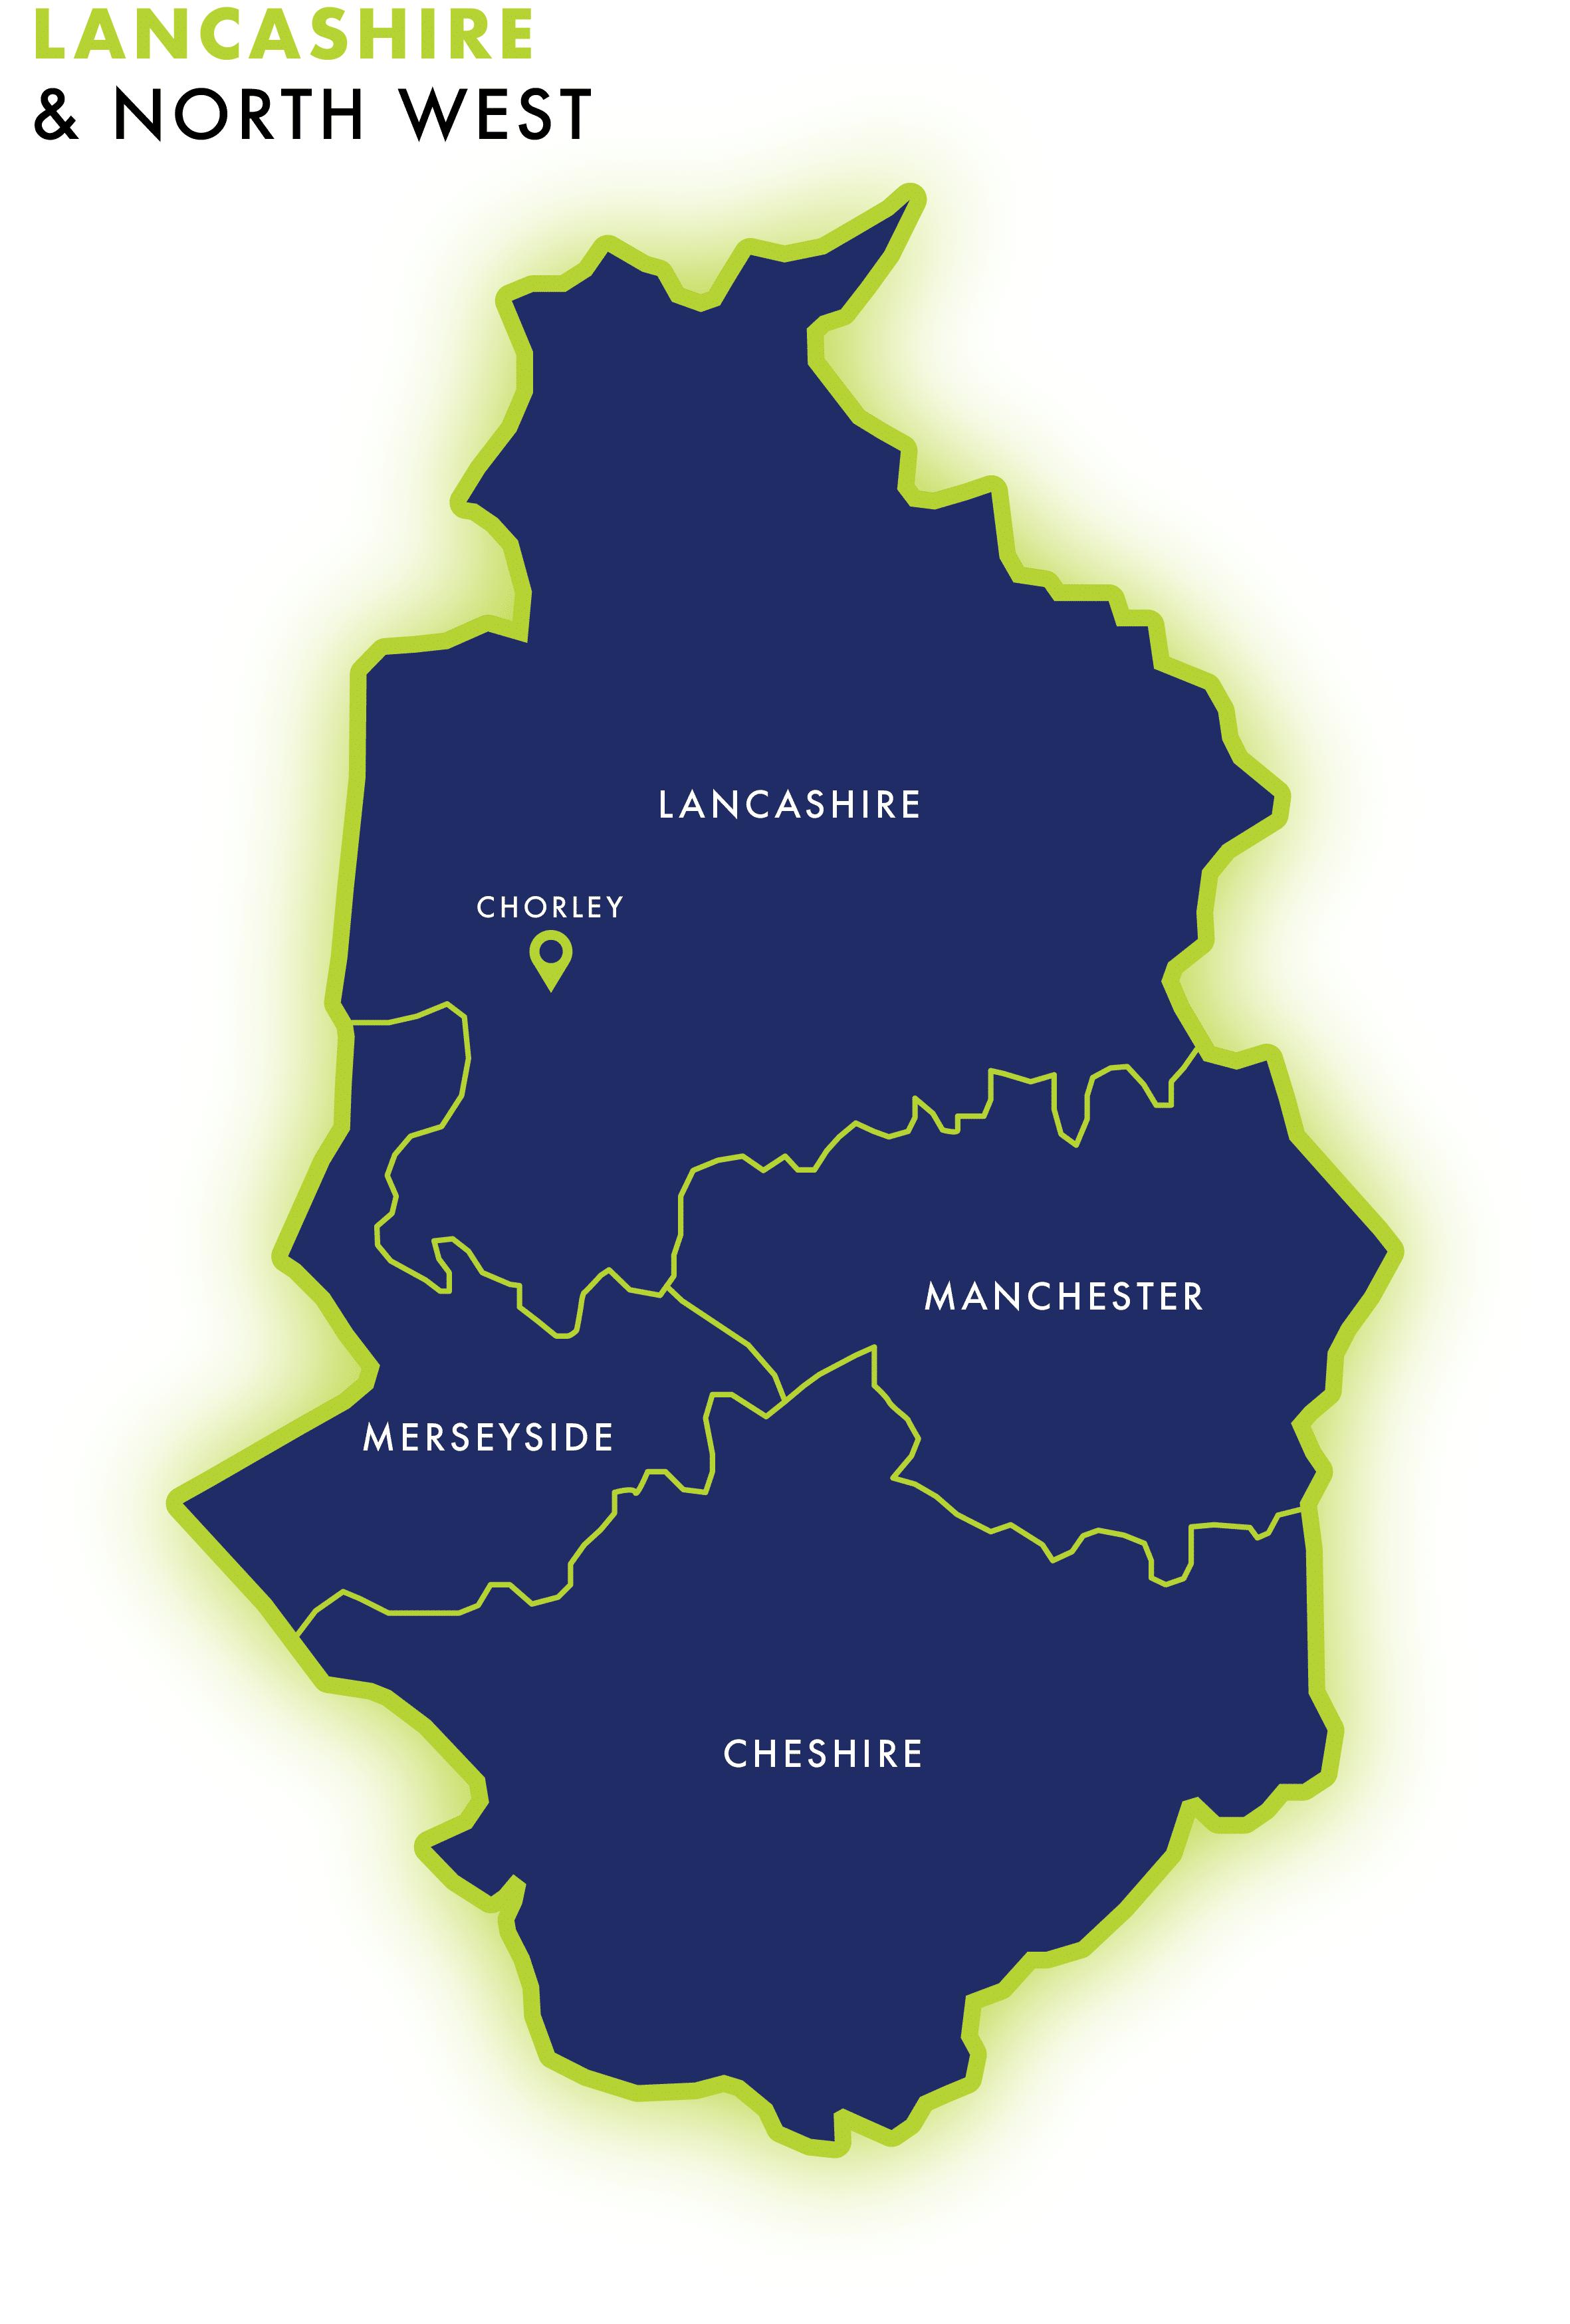 Lancashire IT recruitment map